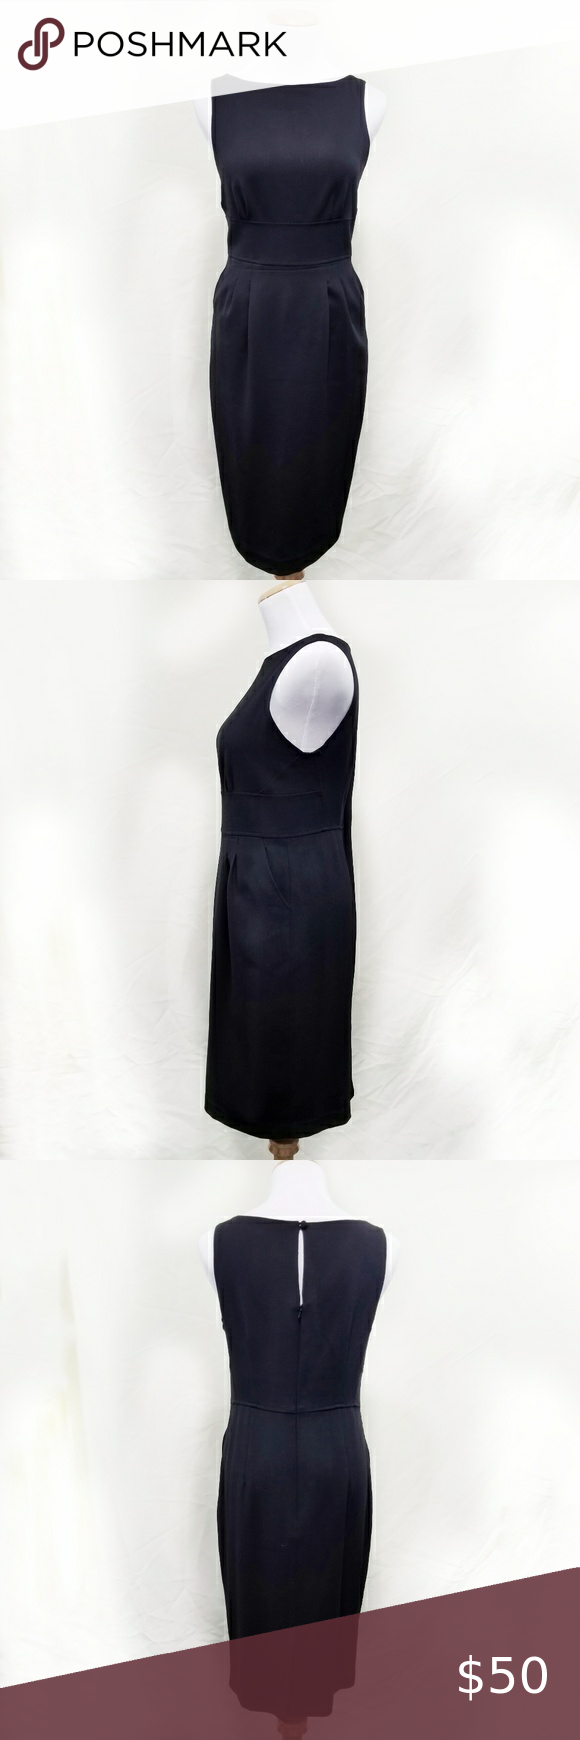 Magaschoni Wool Little Black Dress With Pockets 4 Black Dress With Pockets Little Black Dress Dress Size Chart Women